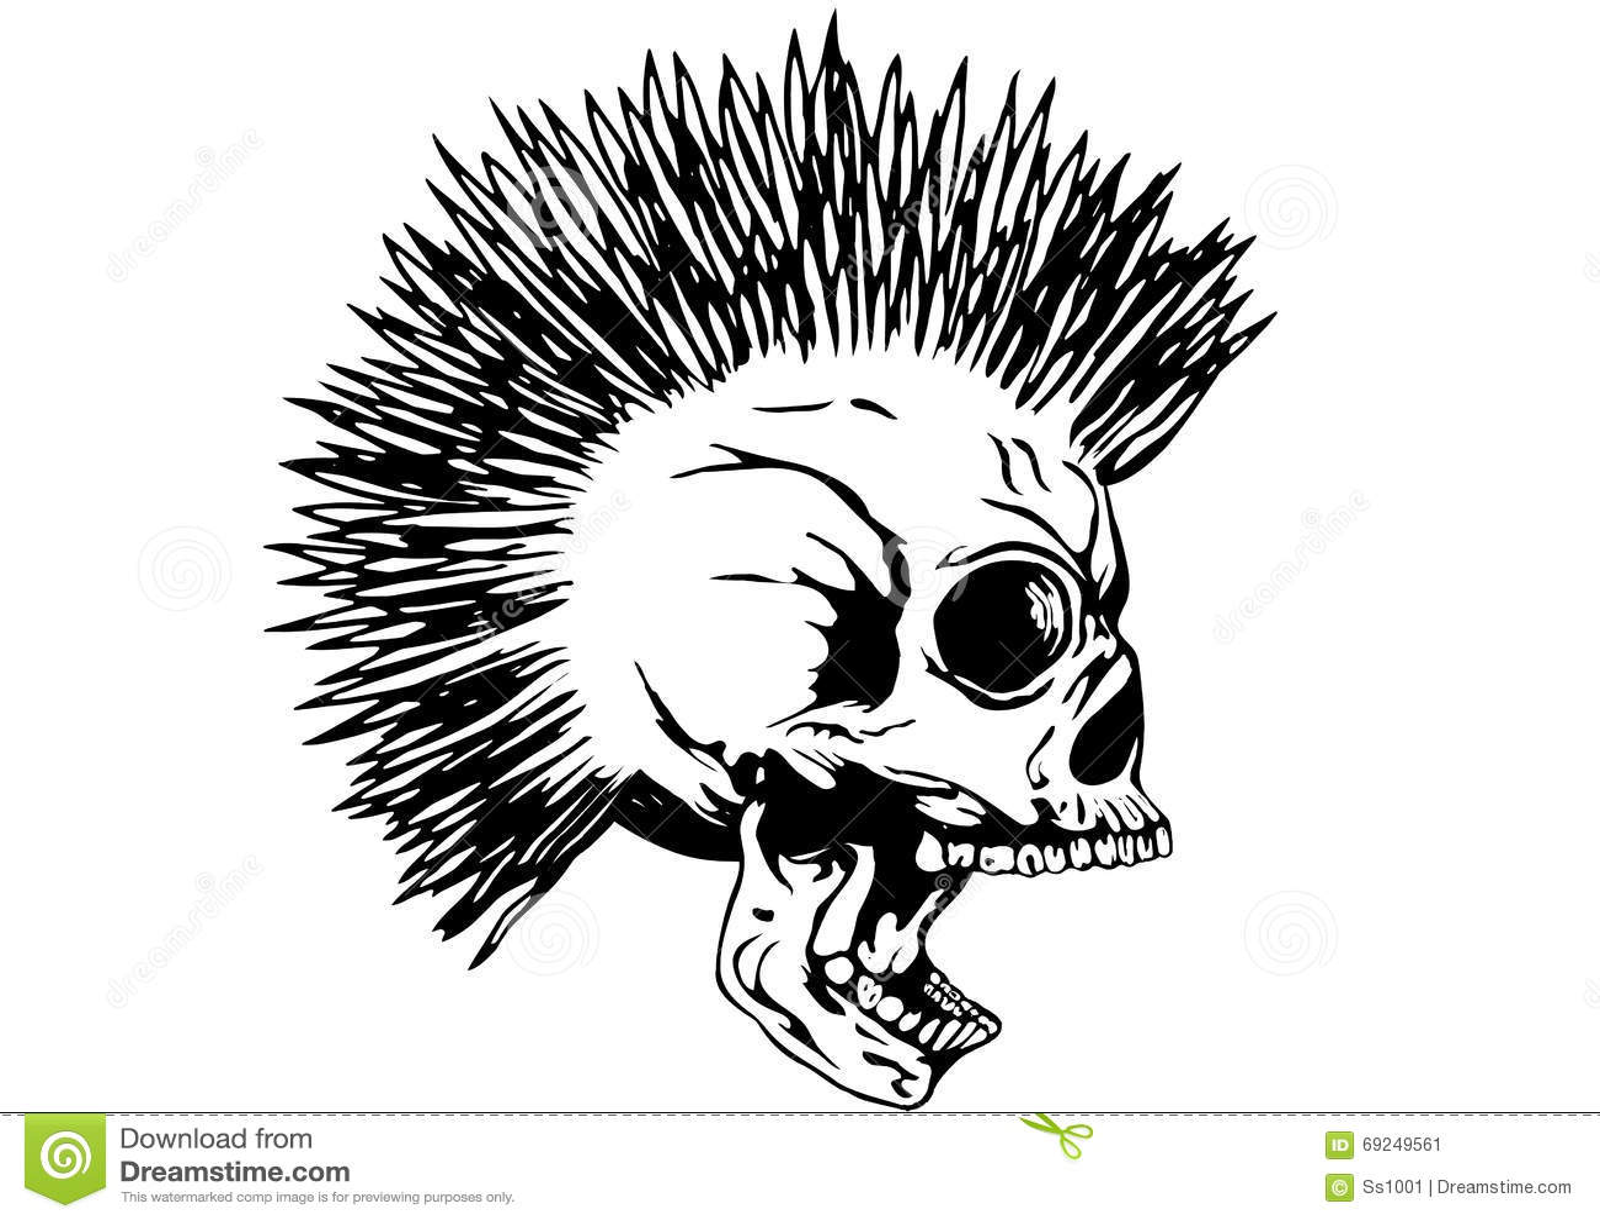 Mohawk Cartoons Illustrations Amp Vector Stock Images